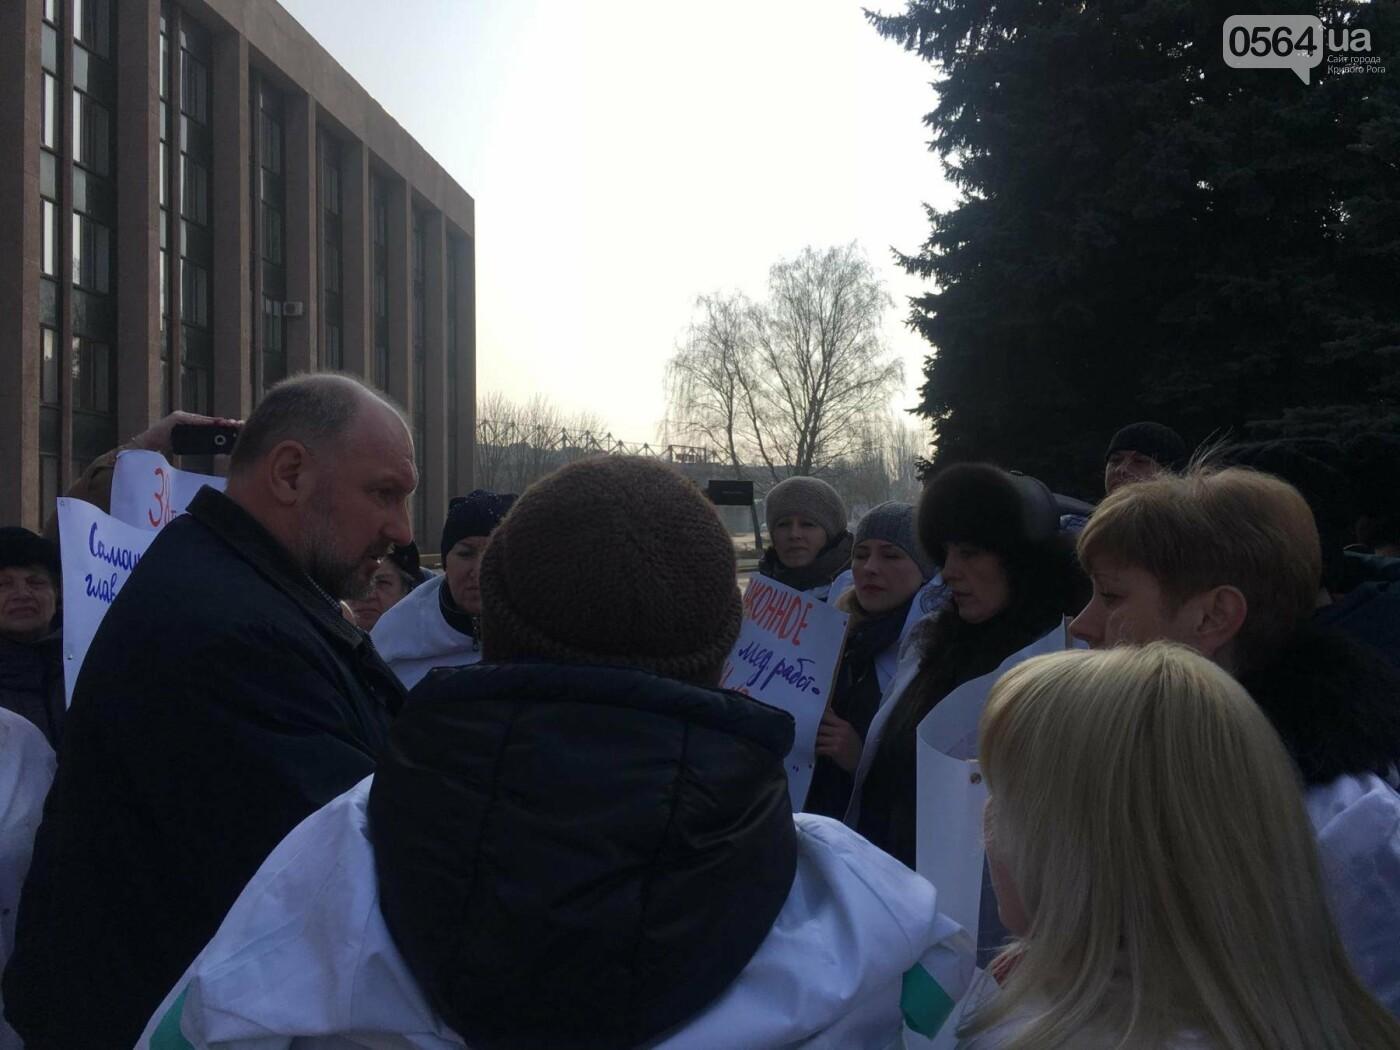 Под стенами Криворожского горисполкома проходит акция протеста медиков (ФОТО), фото-1